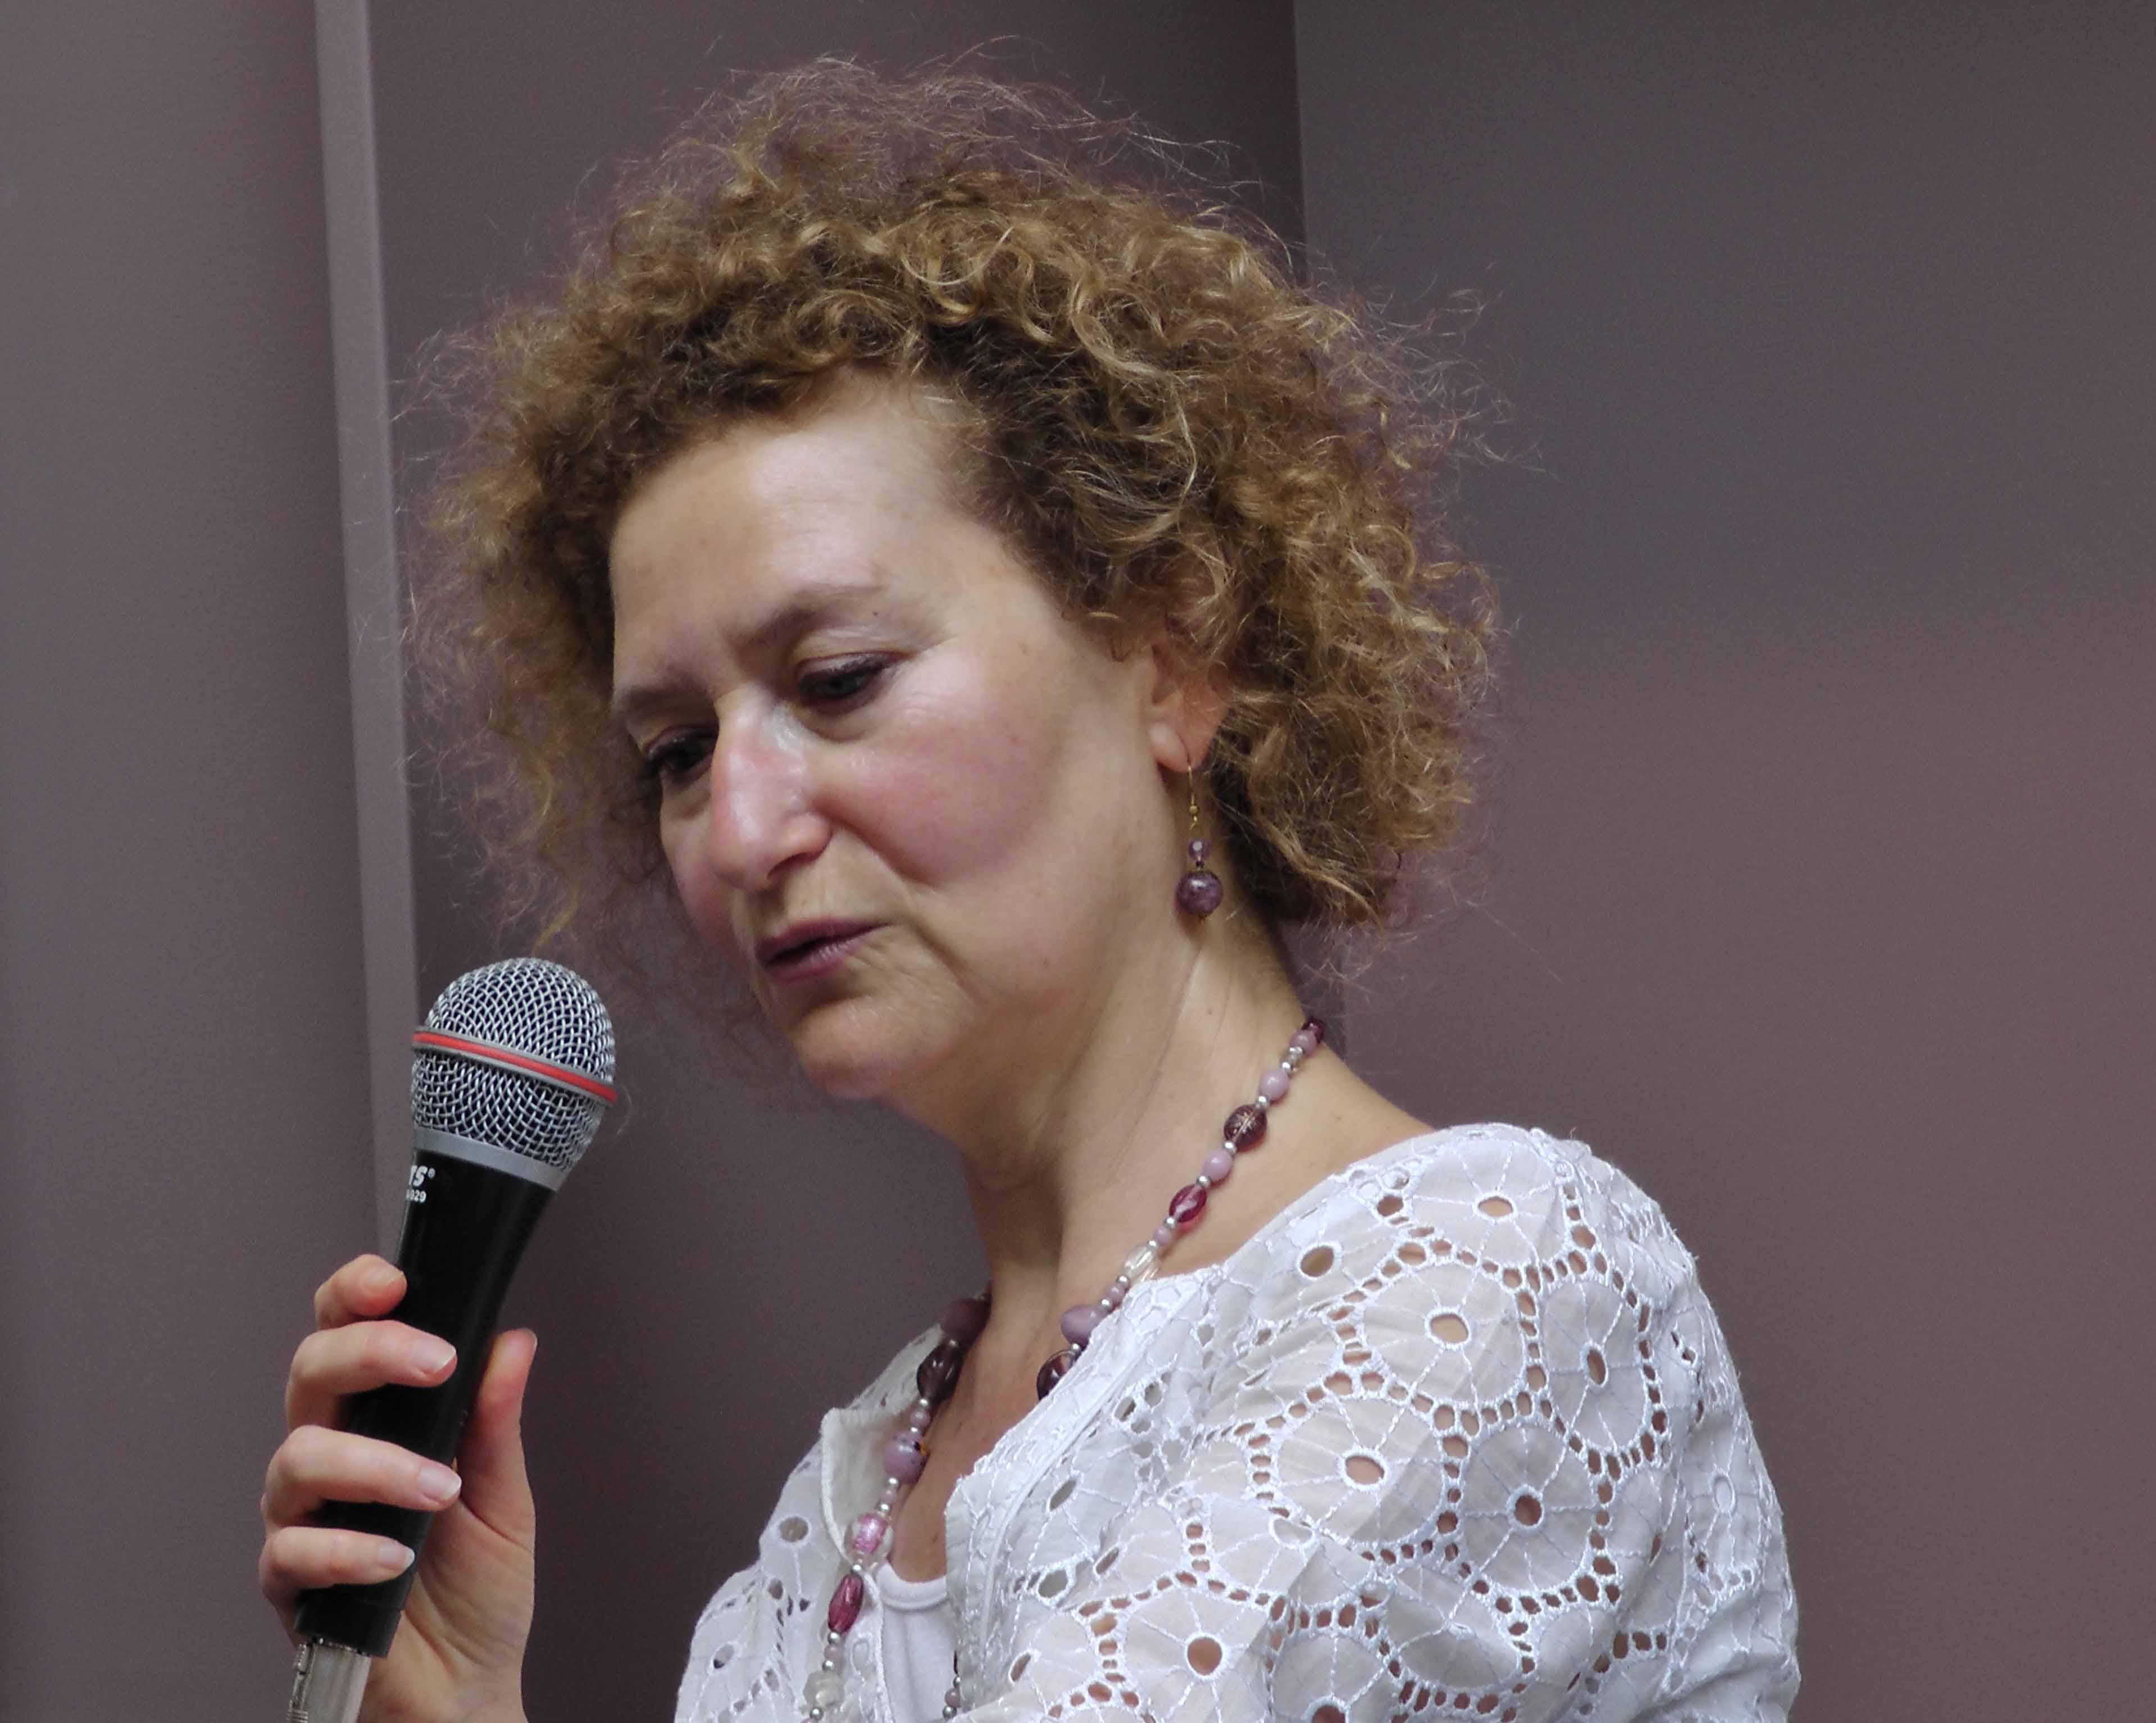 La peintre, psychologue et psychanalyste Rachel Silski